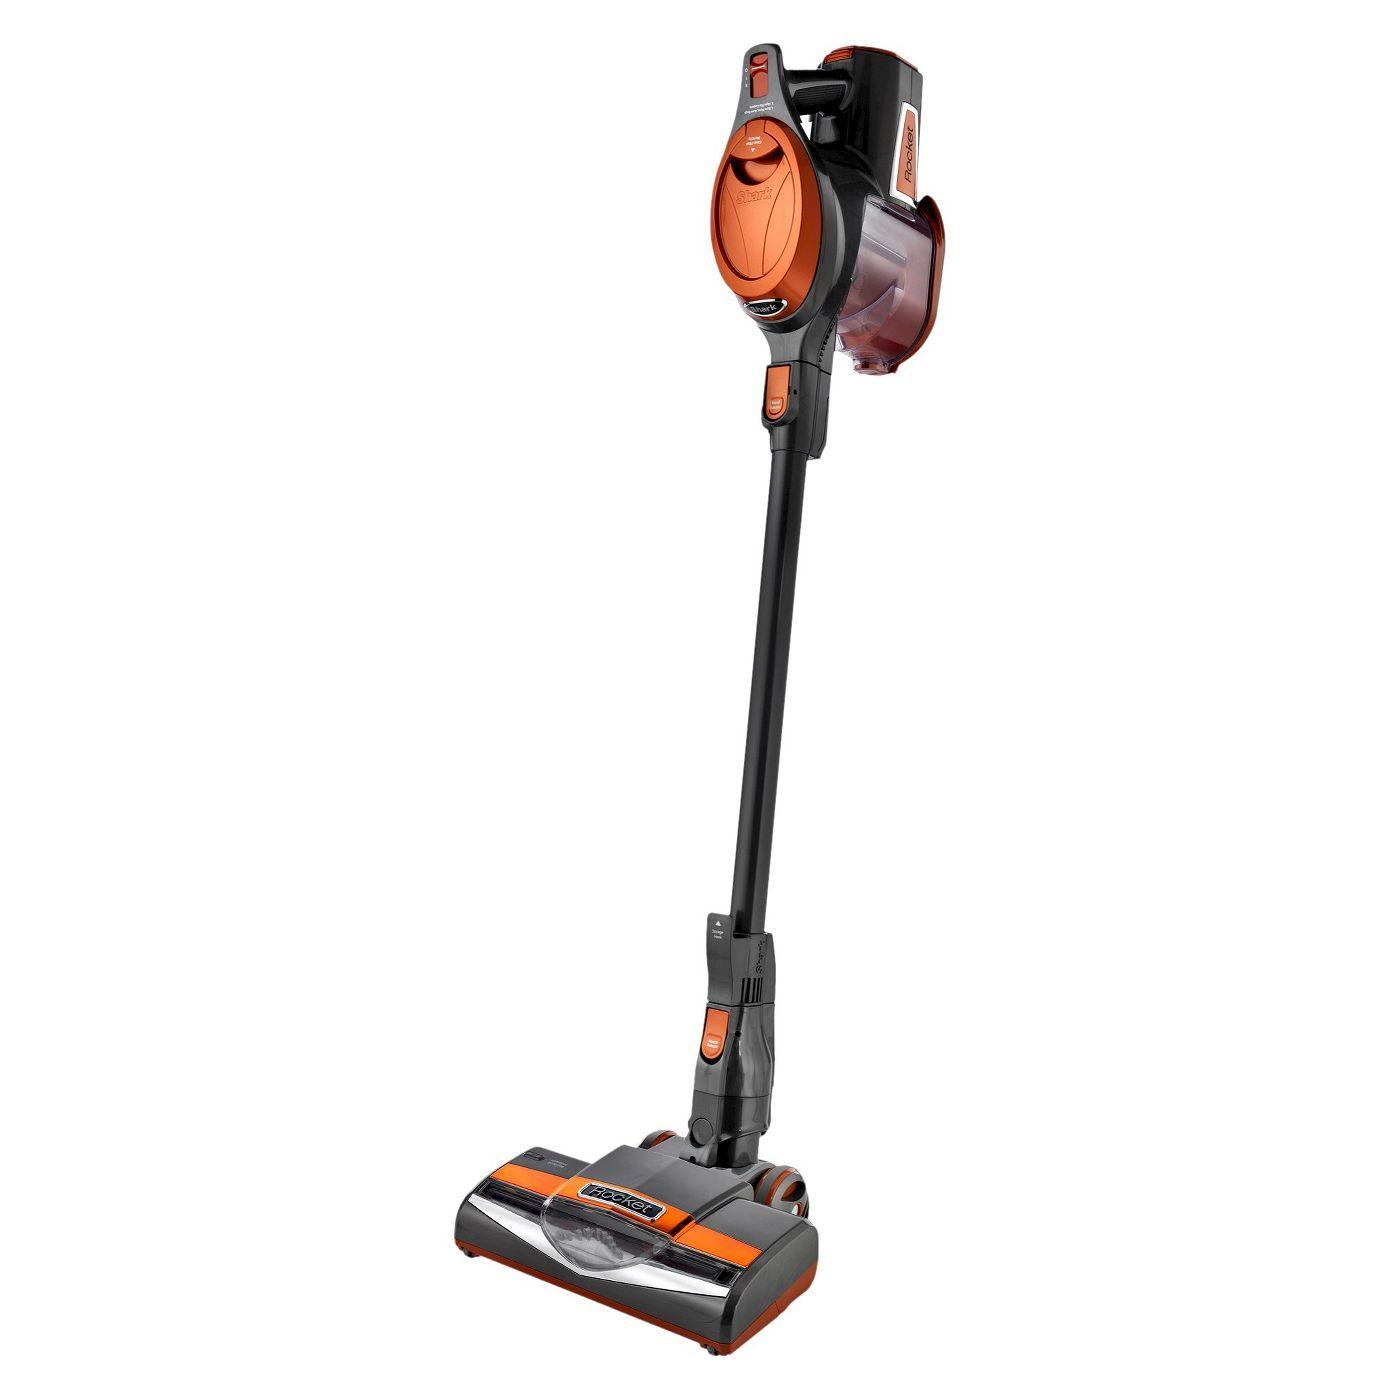 Home appliances: Shark Rocket Ultra-Light Corded Stick Vacuum